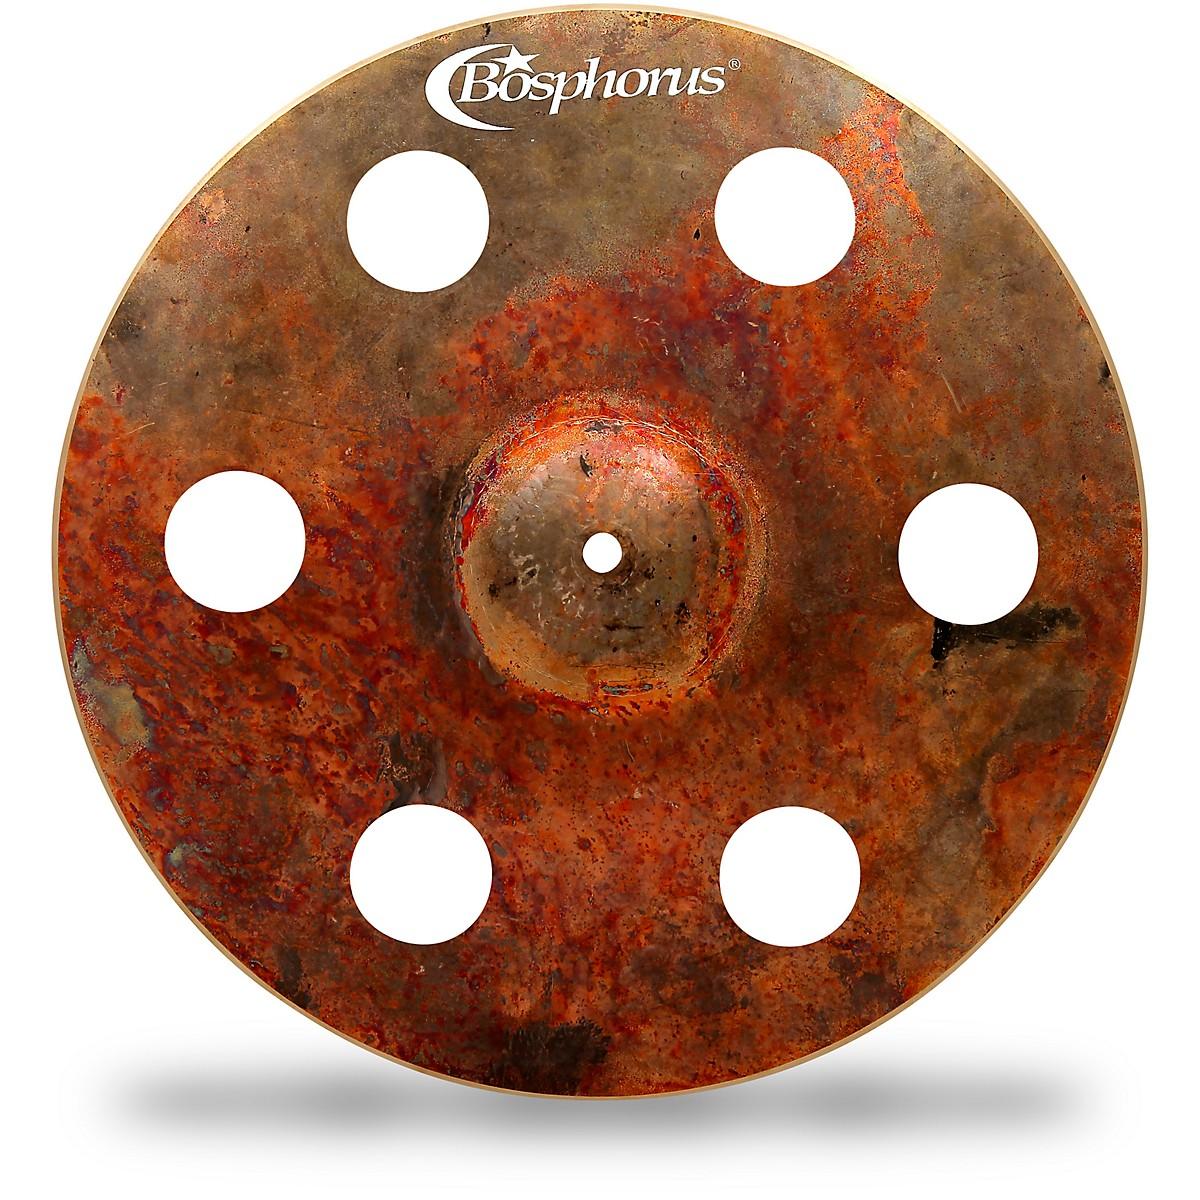 Bosphorus Cymbals Turk Fx Crash with 6 Holes